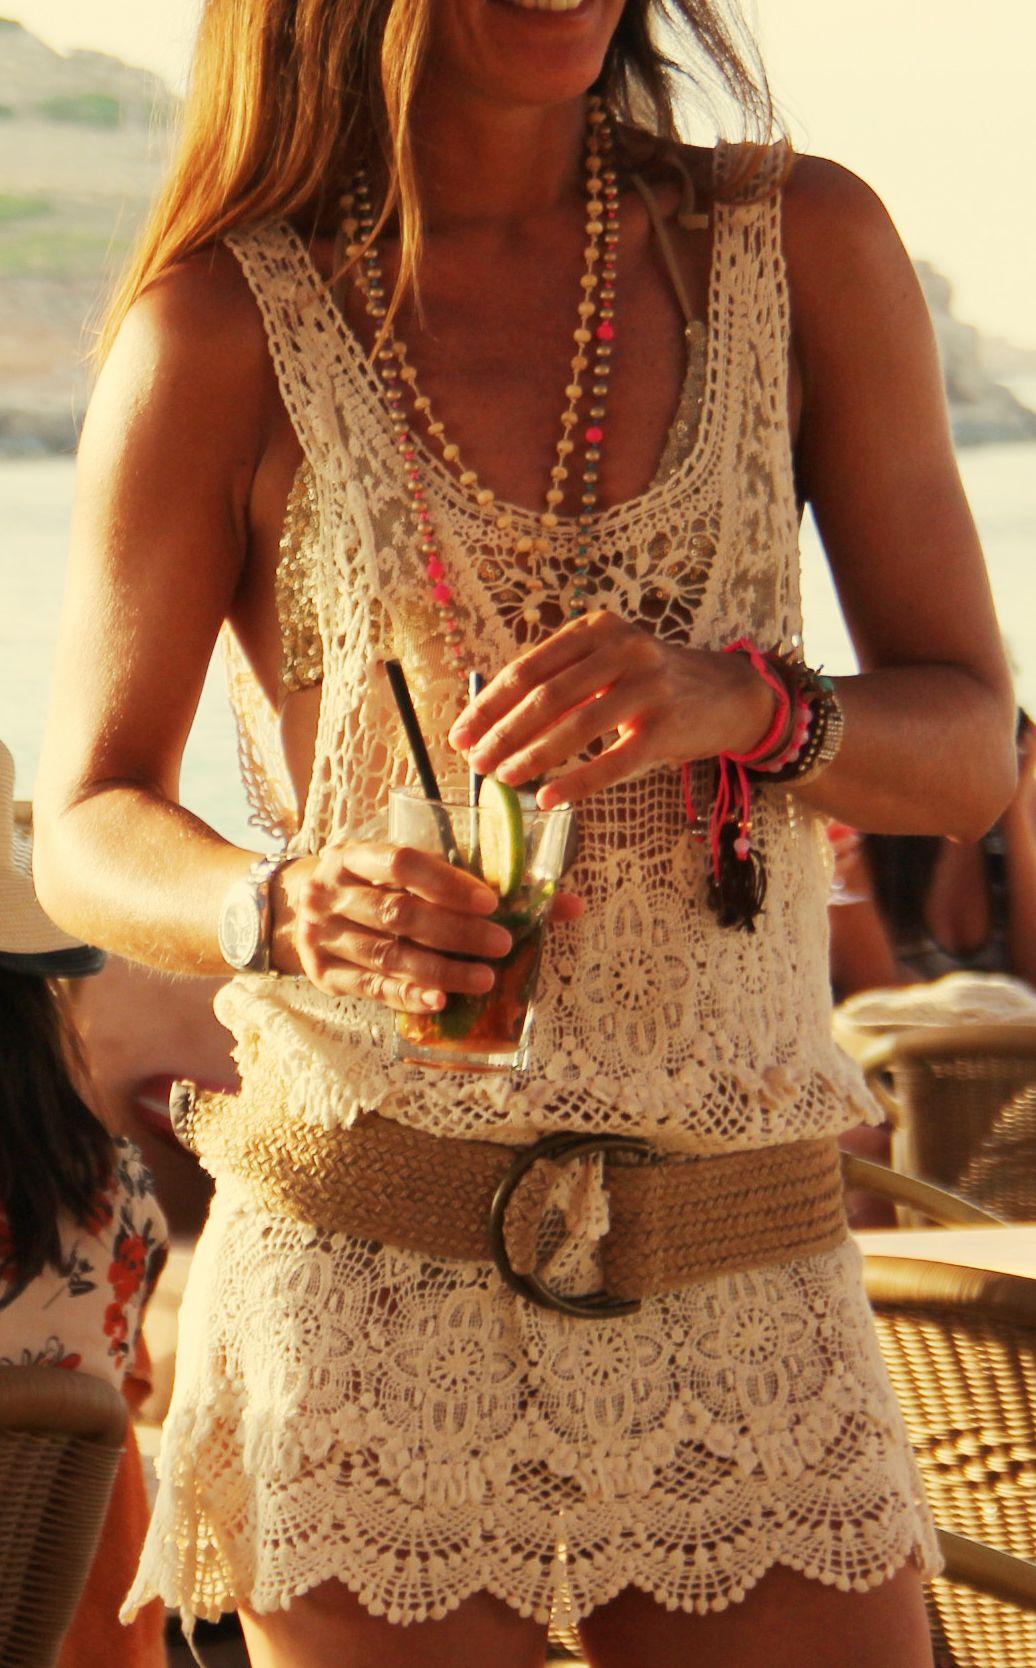 ☮ ➳ American Hippie Bohemian ➳ ☮  - Lace Dress  ...    Boho Bohéme Feathers Gypsy Spirit Bizu Baroque Tati Tati